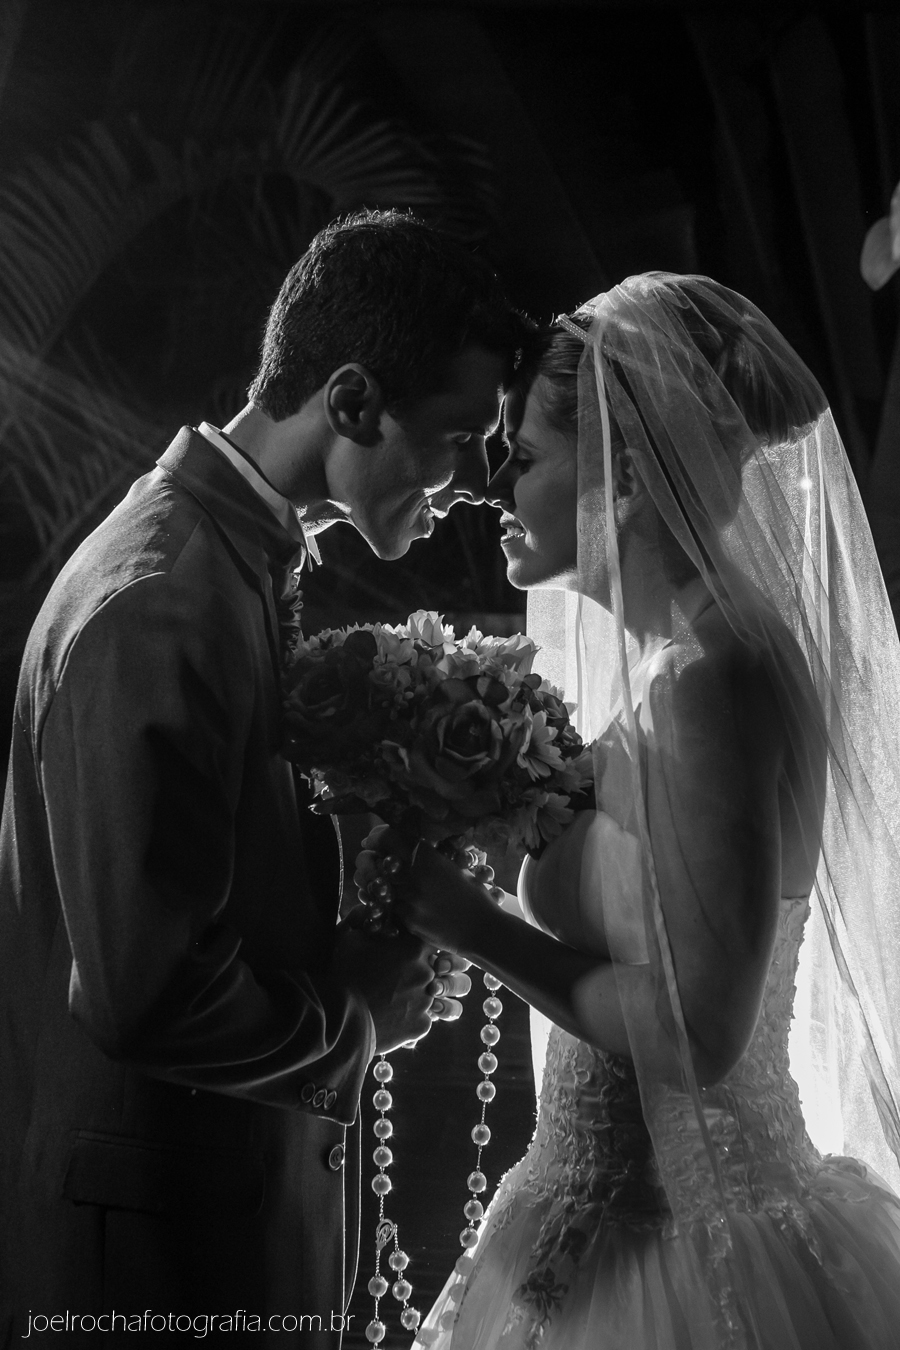 joelrocha-fotografia de casamento (69)